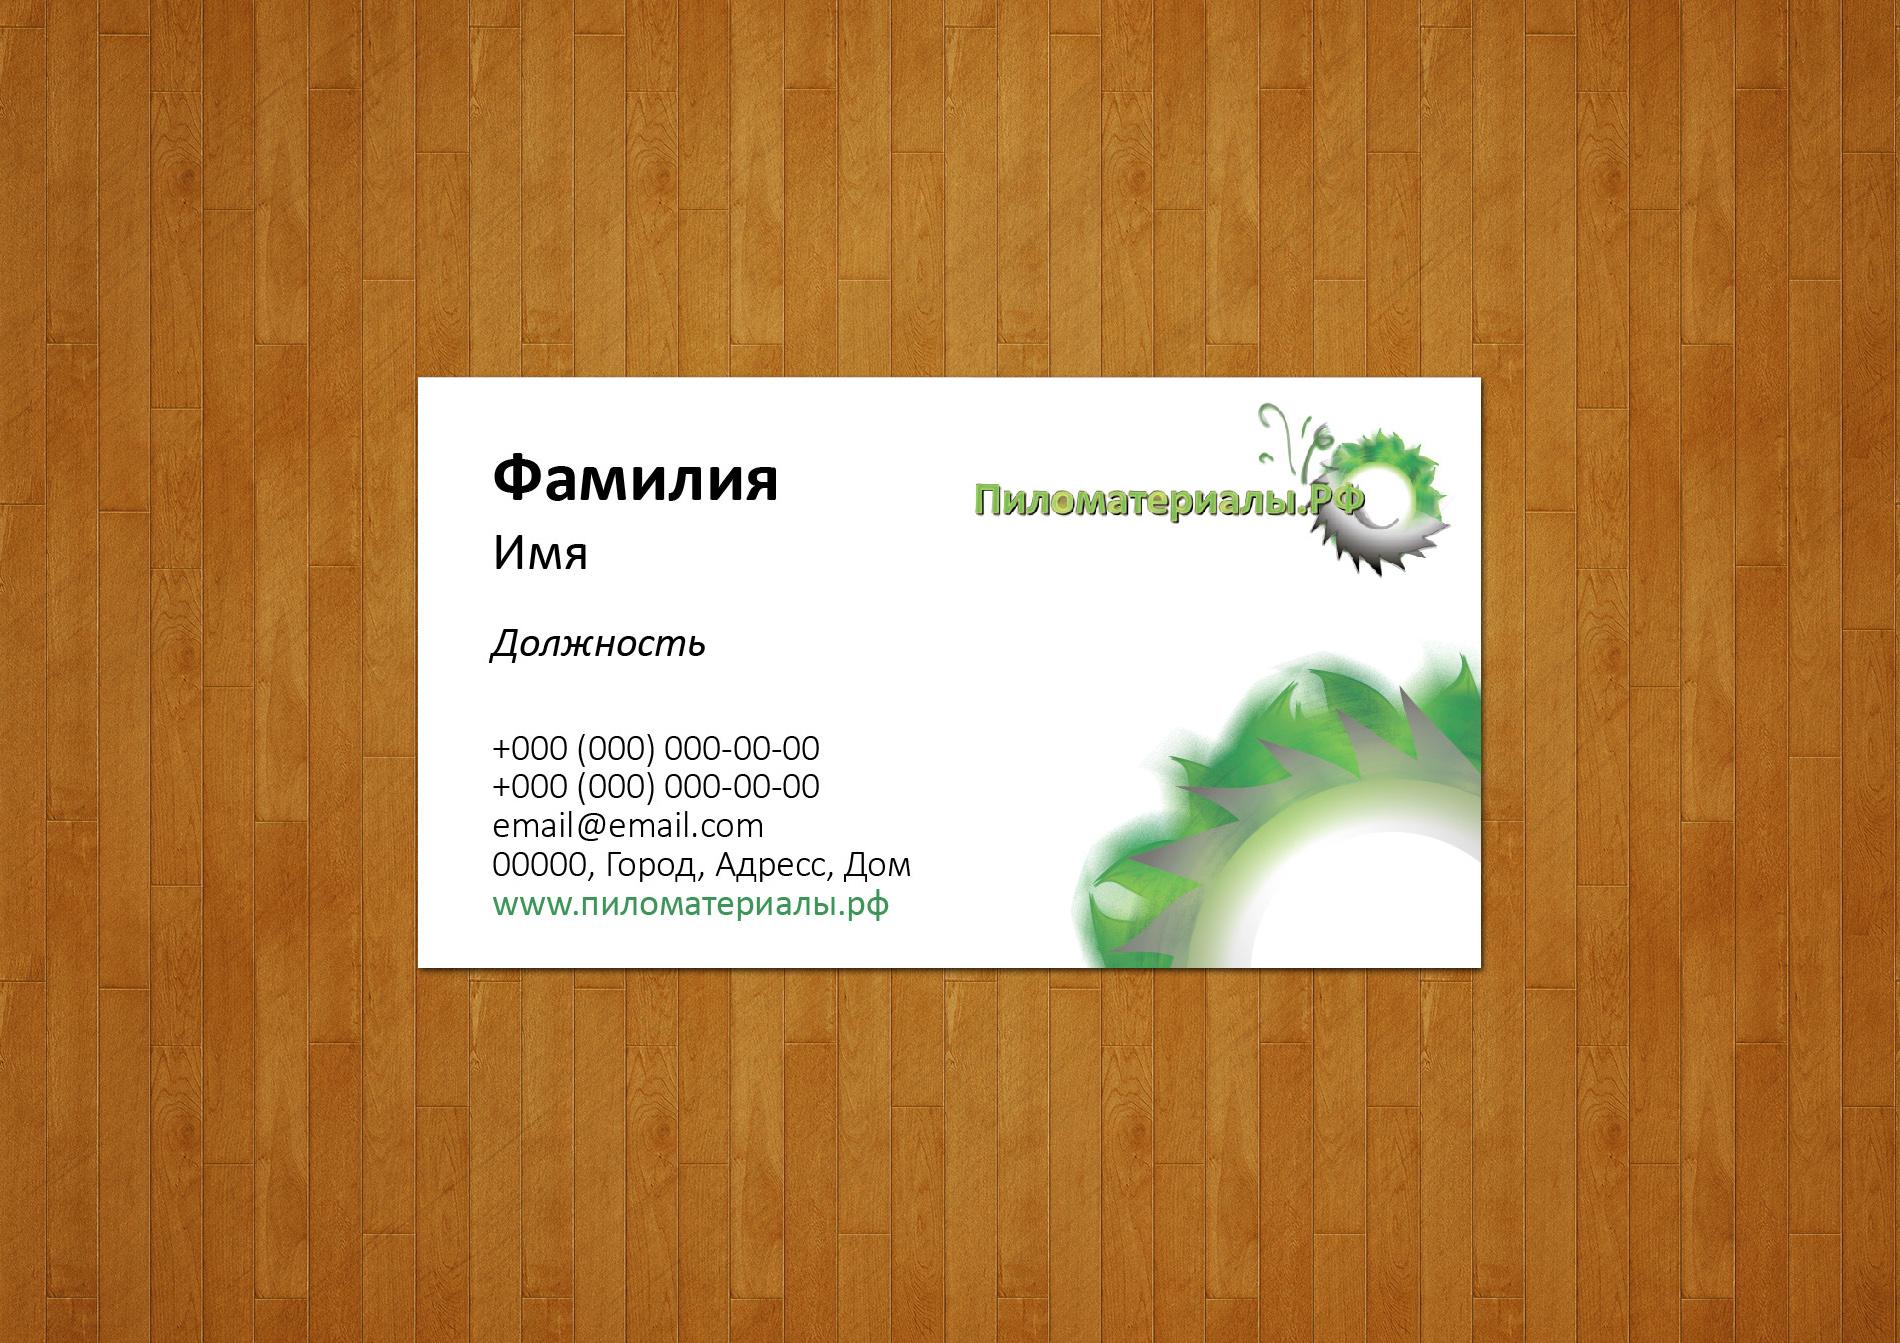 "Создание логотипа и фирменного стиля ""Пиломатериалы.РФ"" фото f_16852f39389b7fdb.jpg"